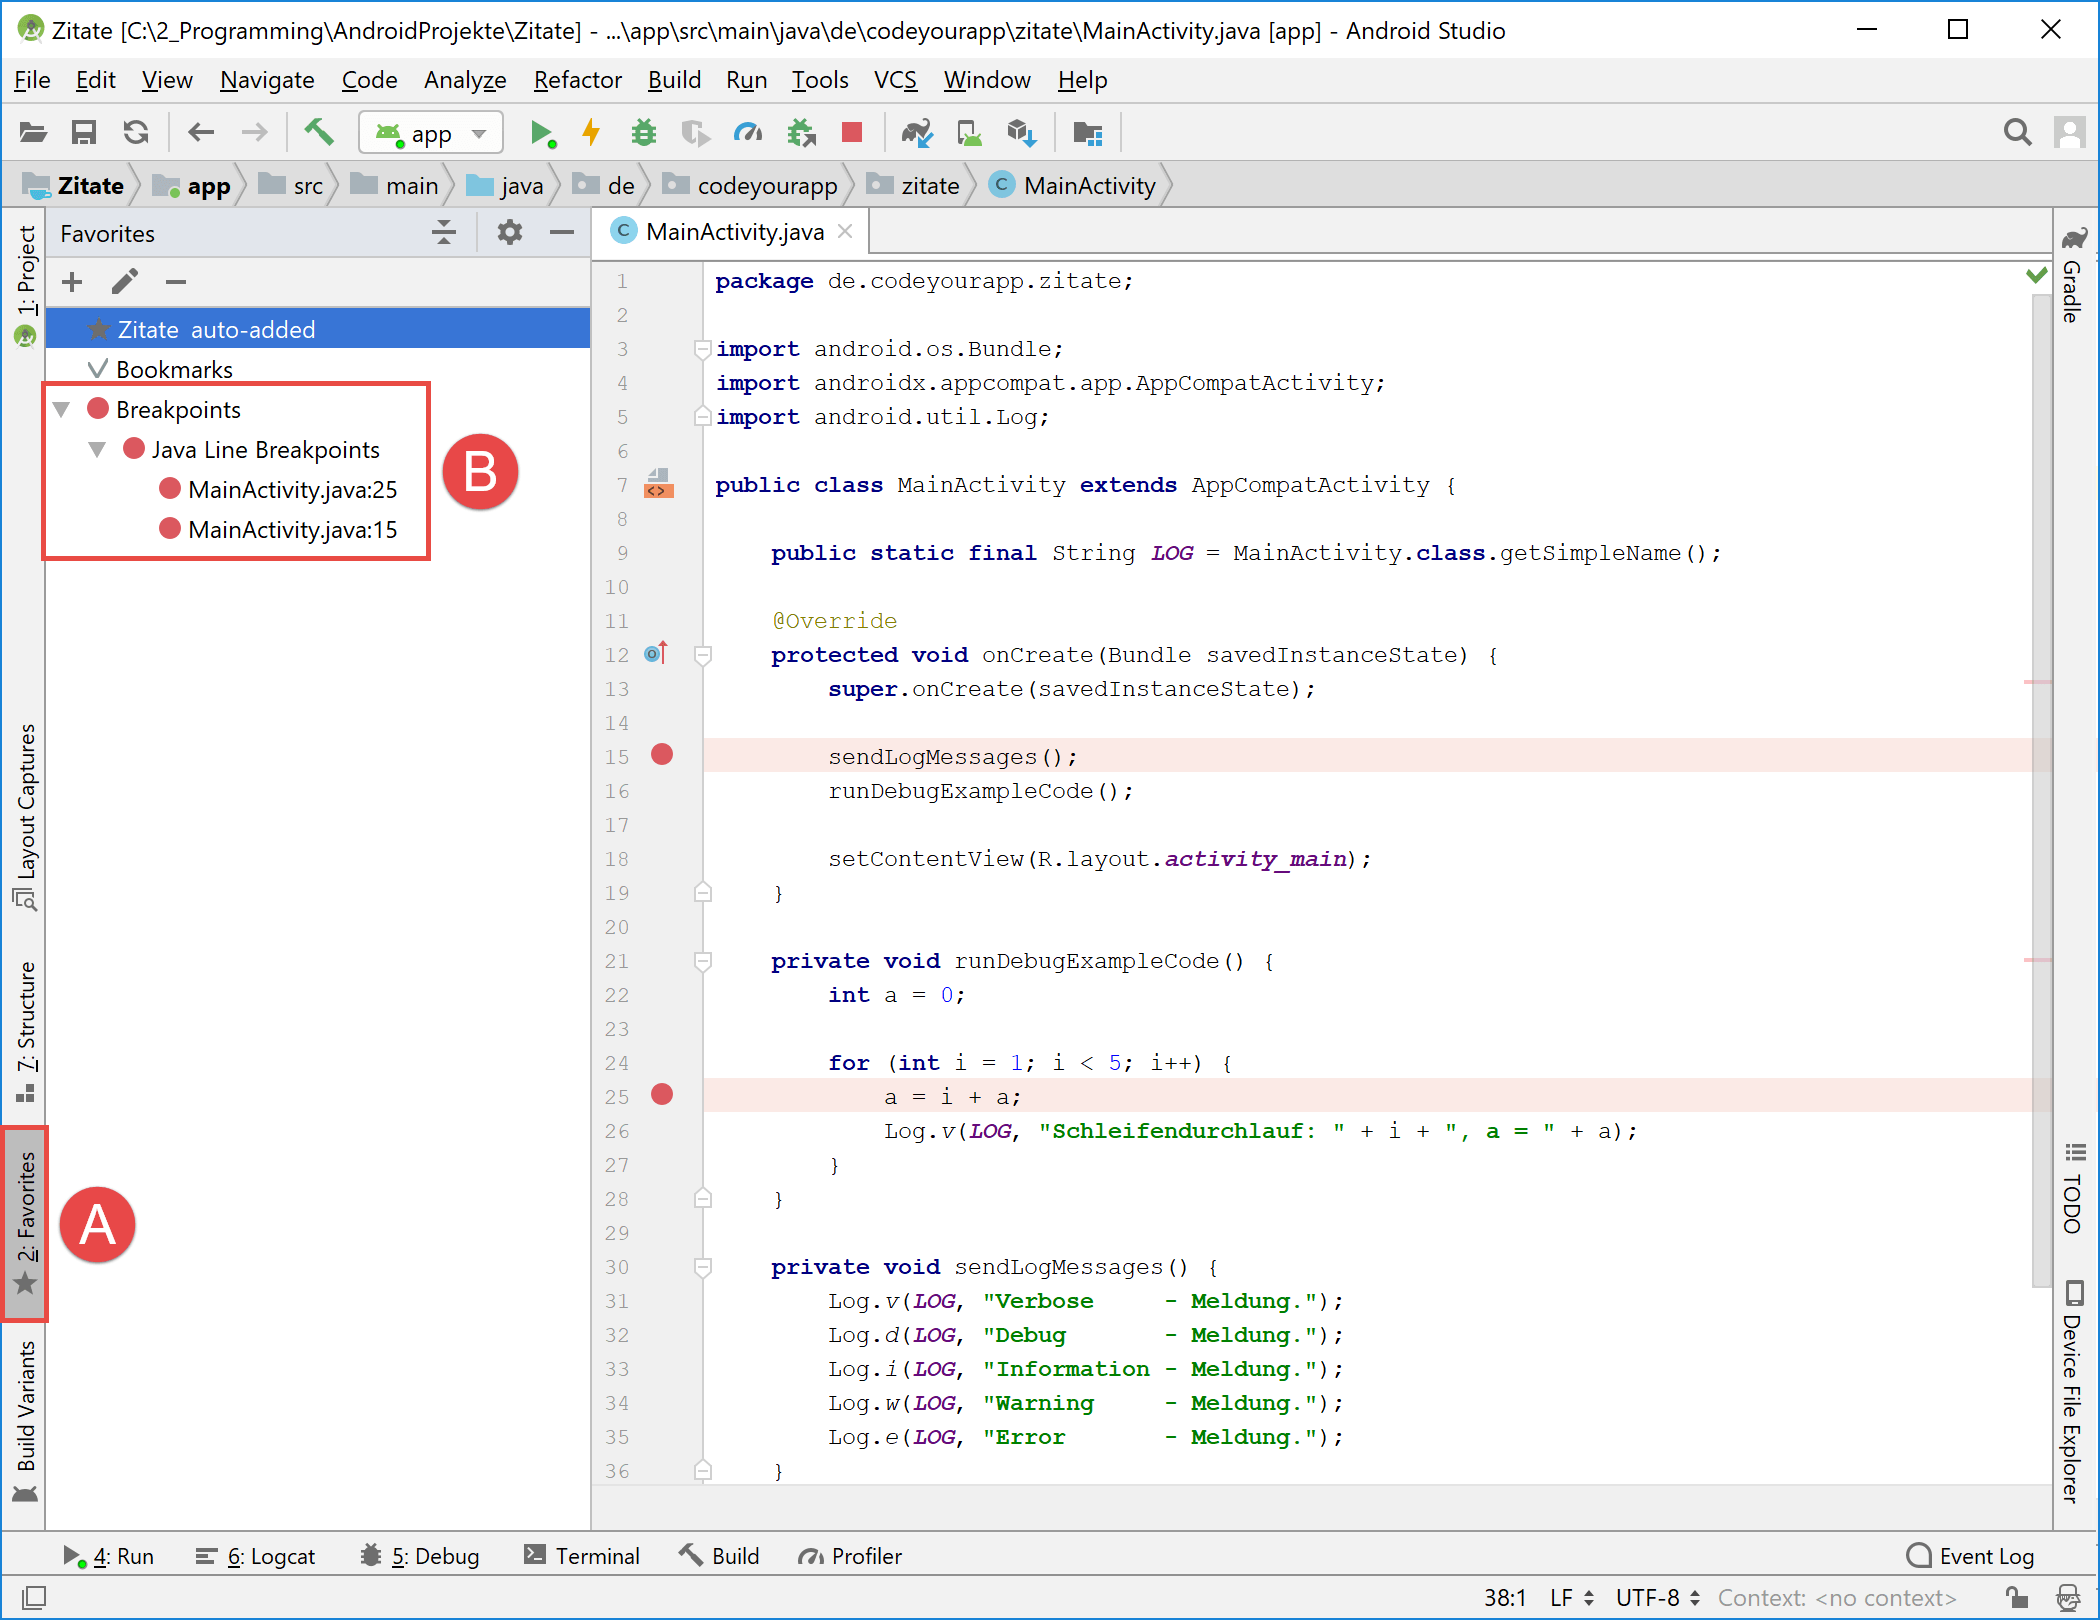 debug_favorites_tool_window